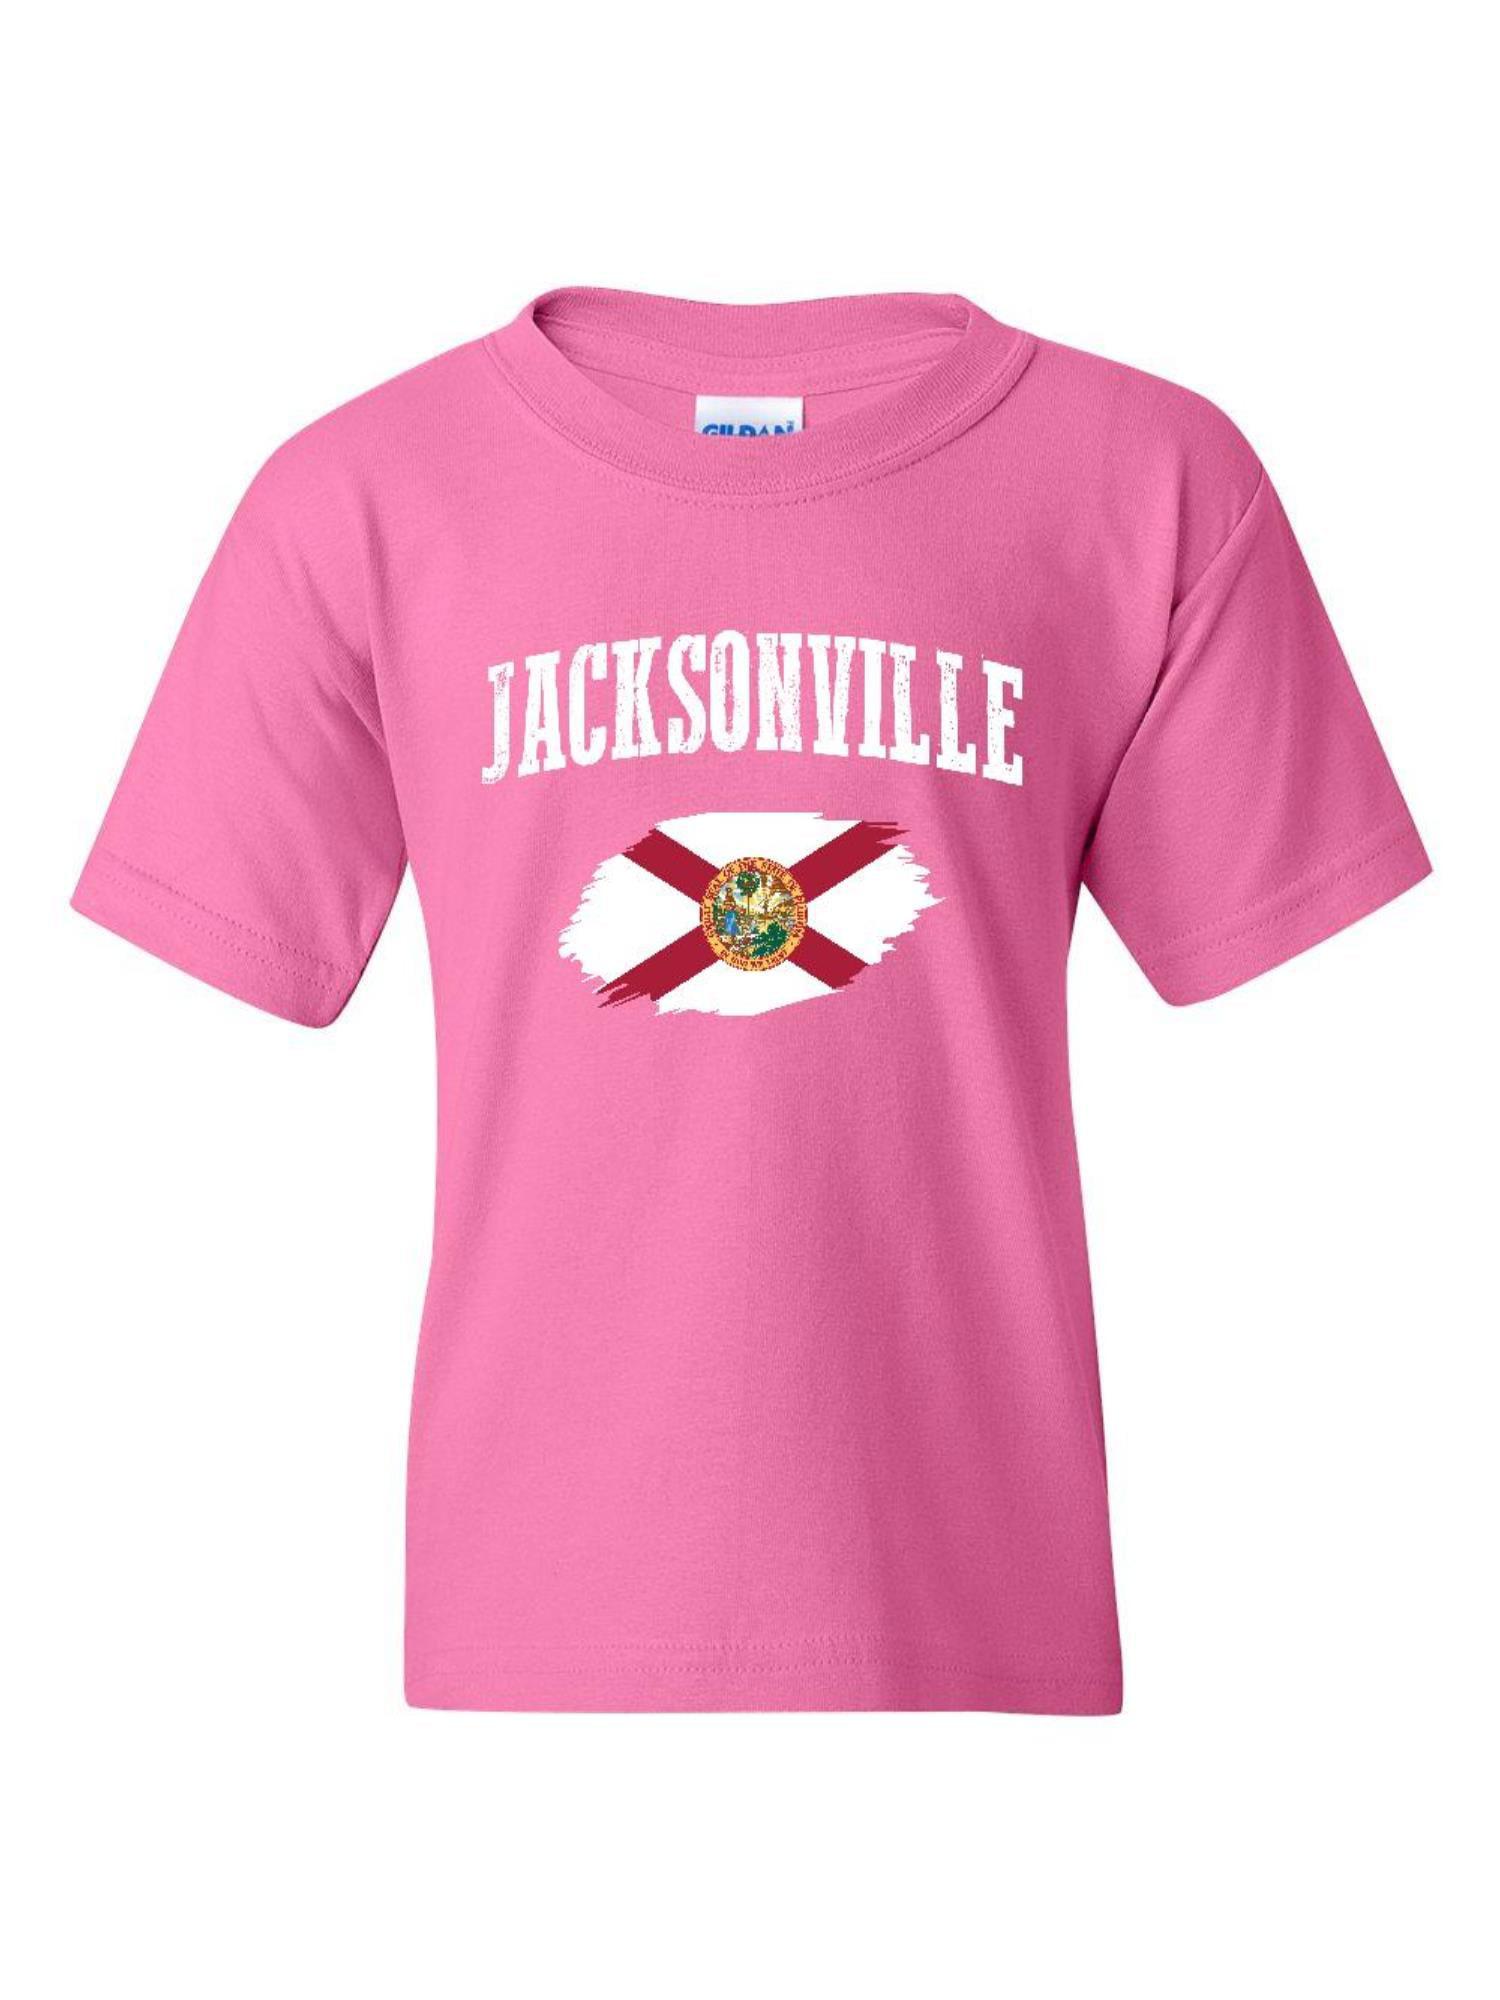 1288543a Jacksonville Florida Unisex Youth Kids T-Shirt Tee